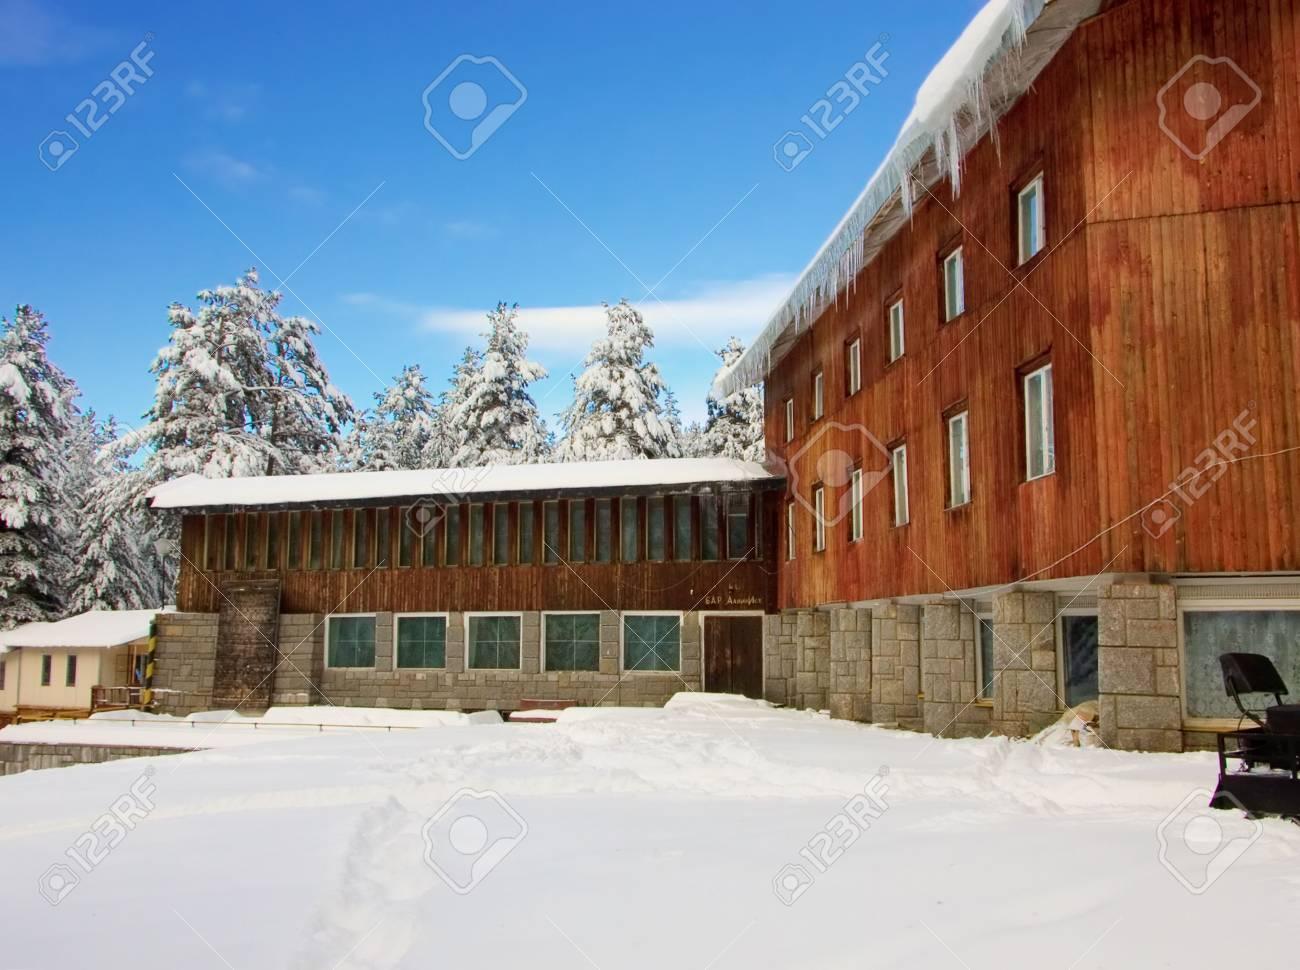 Ski resort in Bulgaria, East Europe Stock Photo - 437617